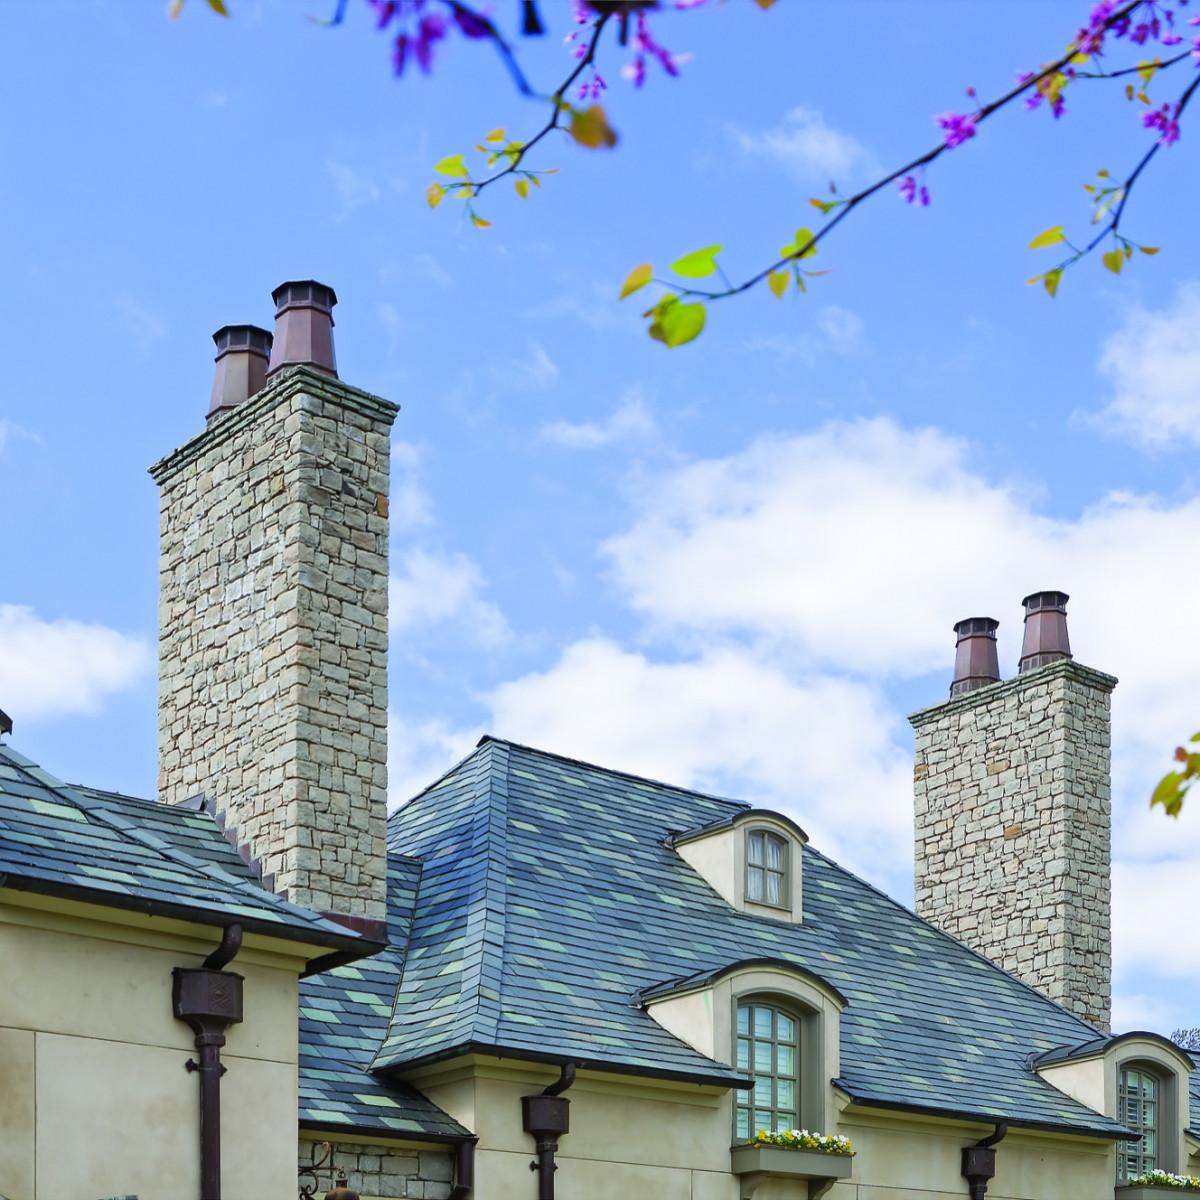 decorative chimney pots on memphis home